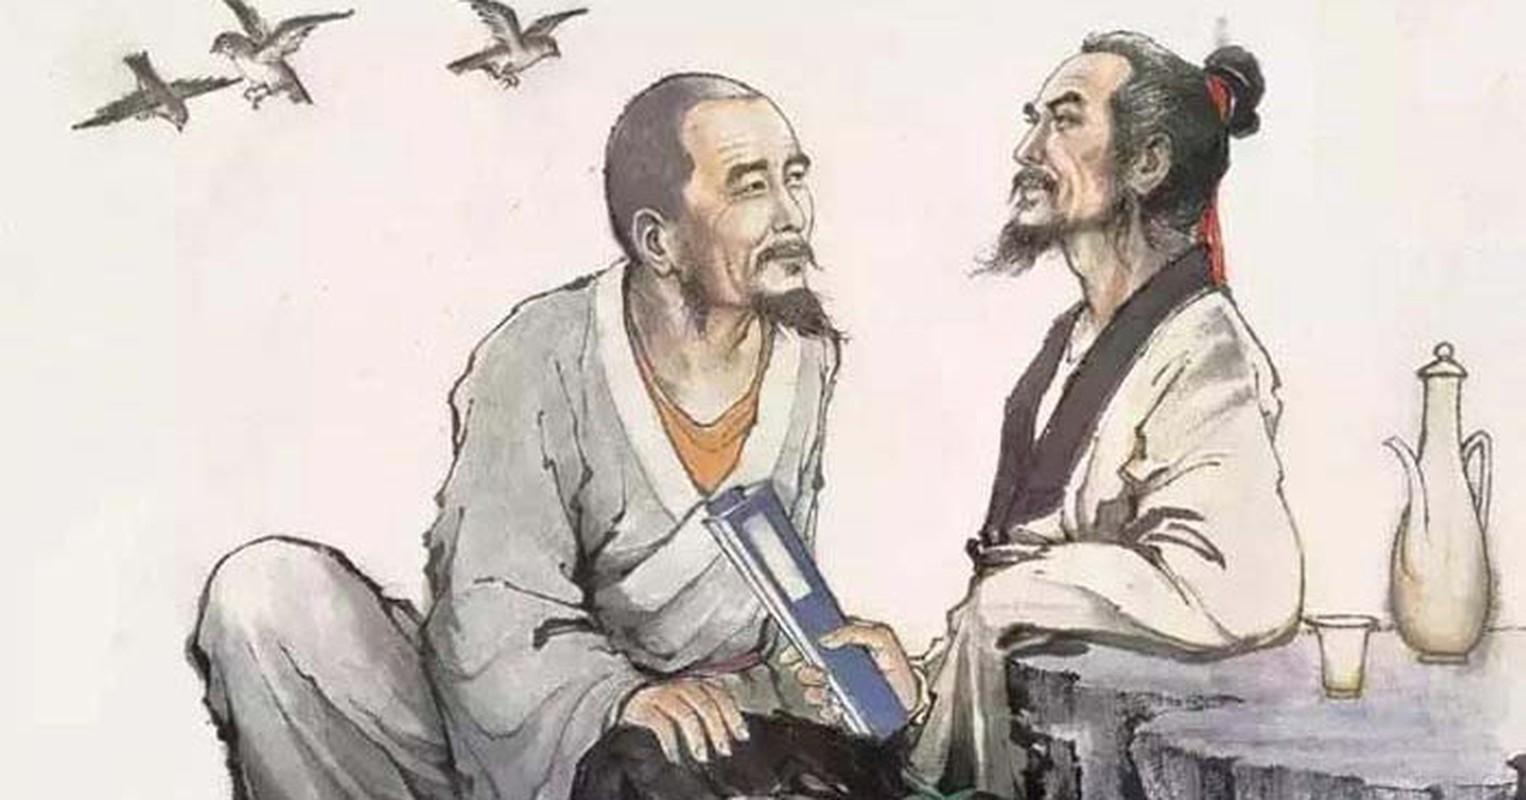 Nhung diem doc dao trong Ban den choi nha cua nha tho Nguyen Khuyen-Hinh-7